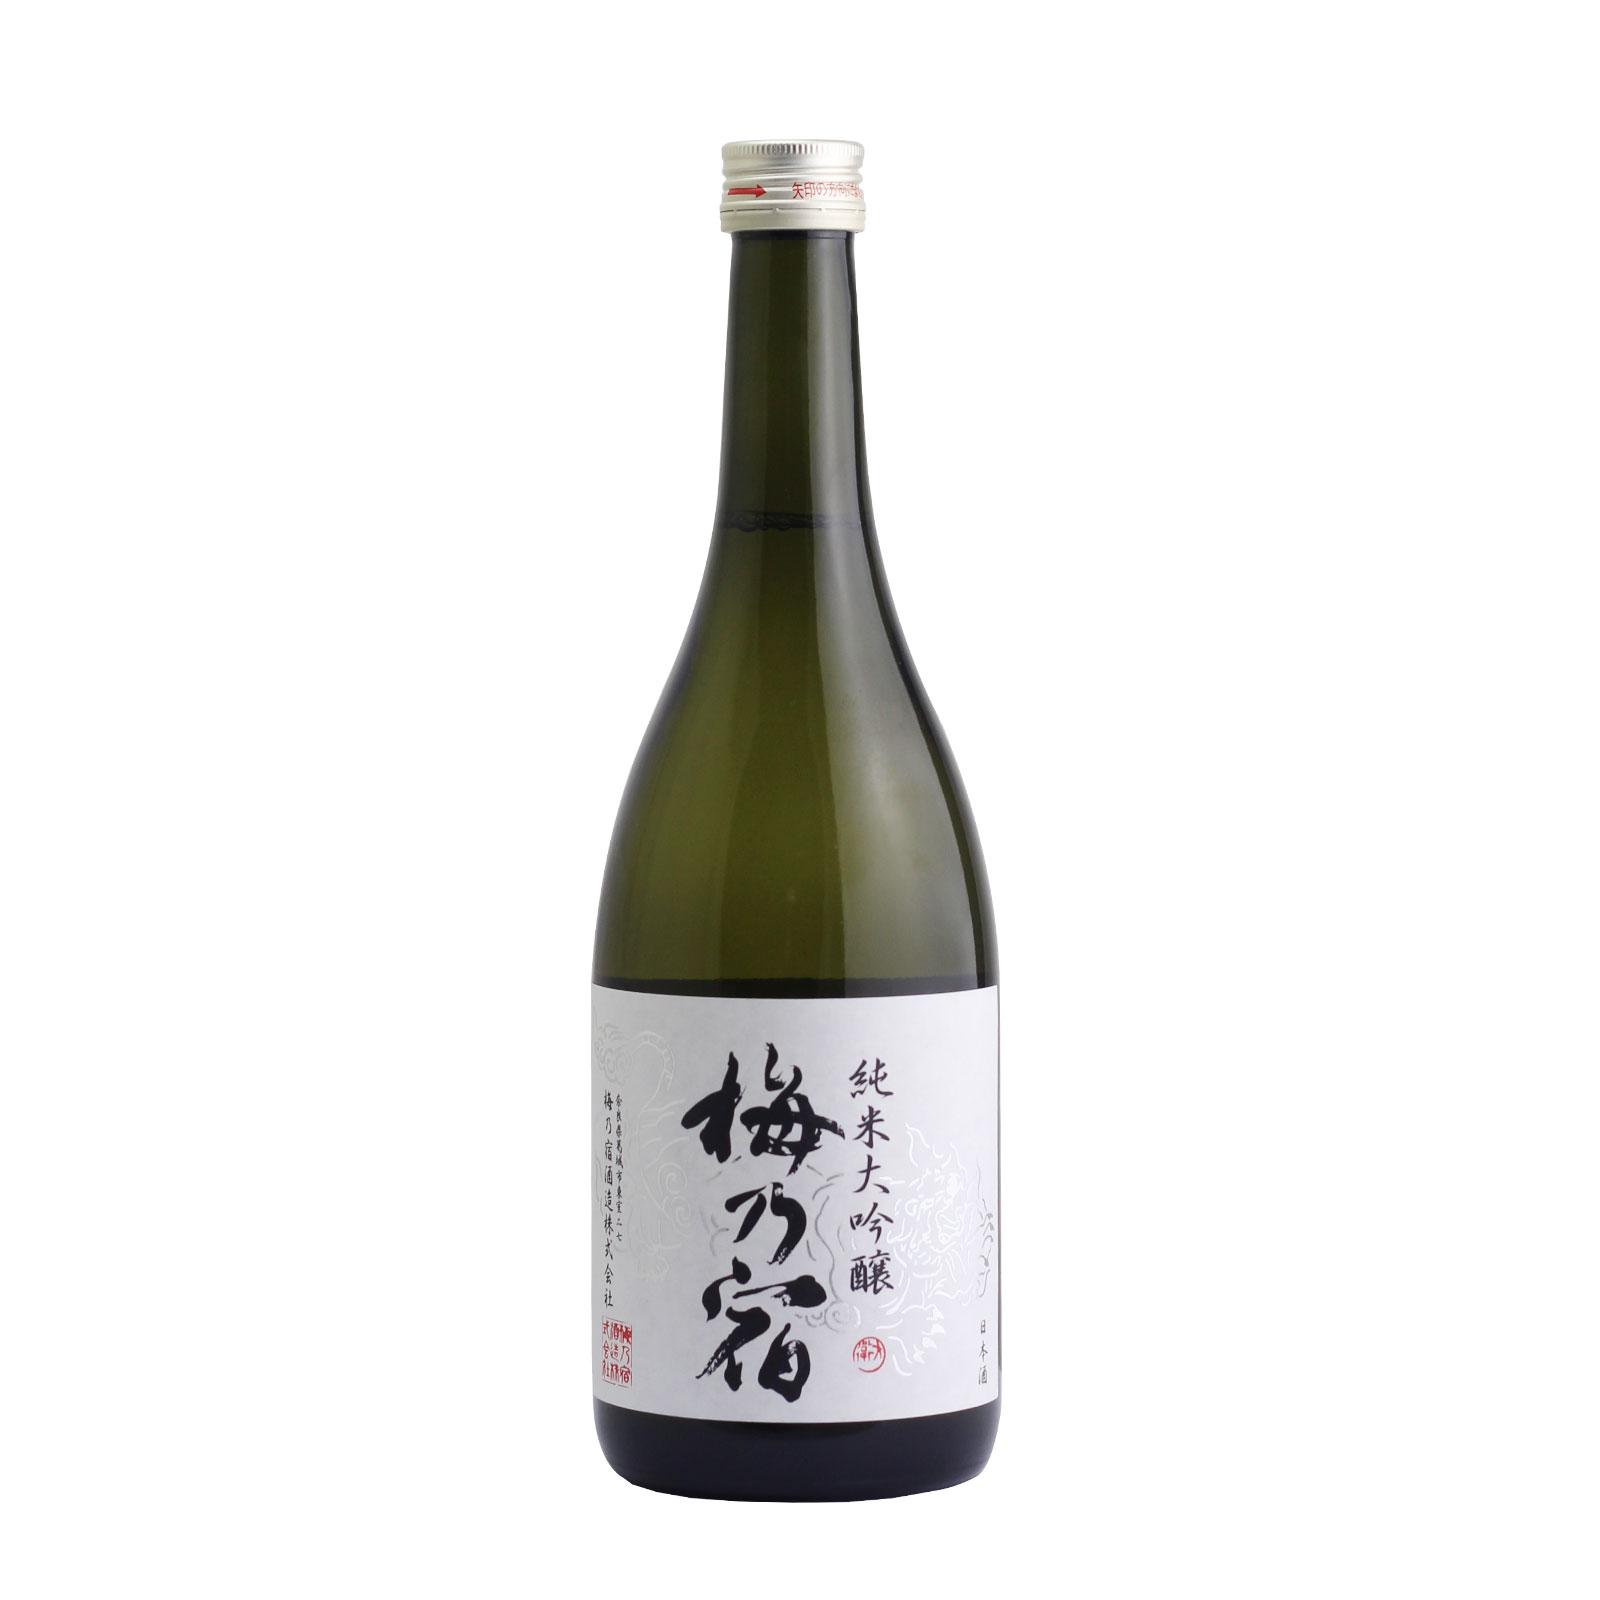 Umenoyado Junmai Daiginjo WT 16% 720ml